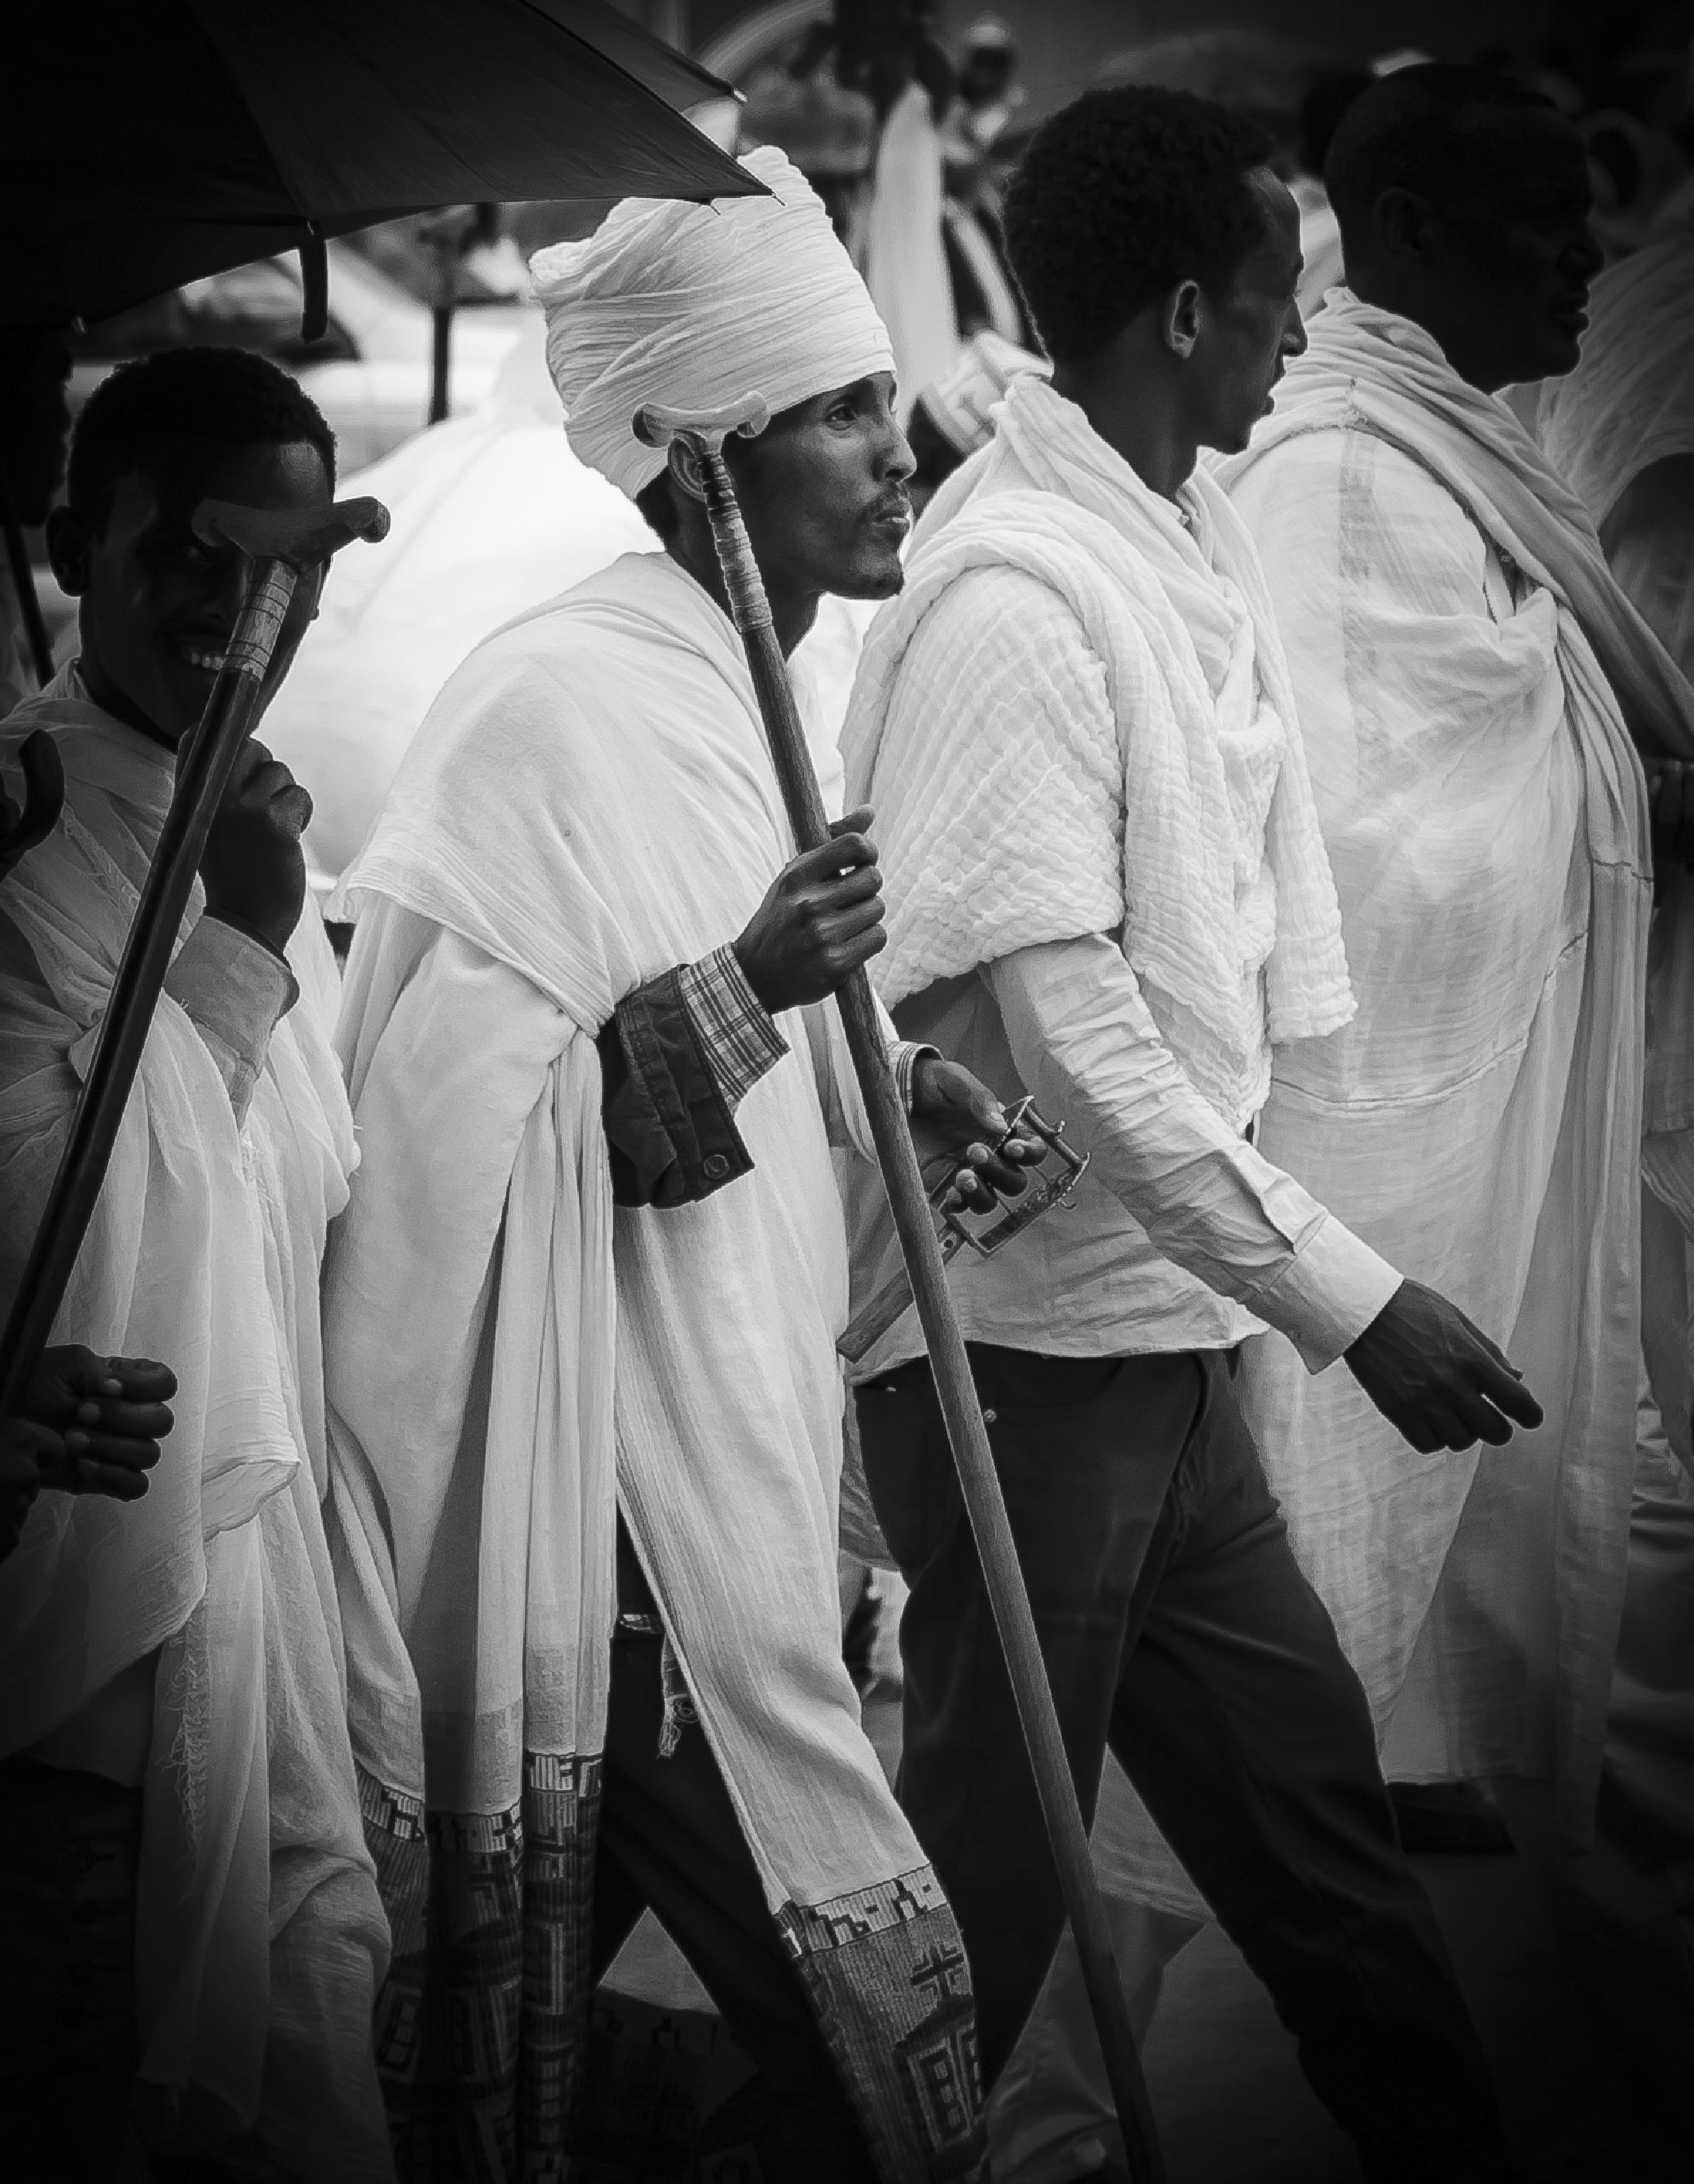 Ethiopian Priest by Liyat G Haile Photography